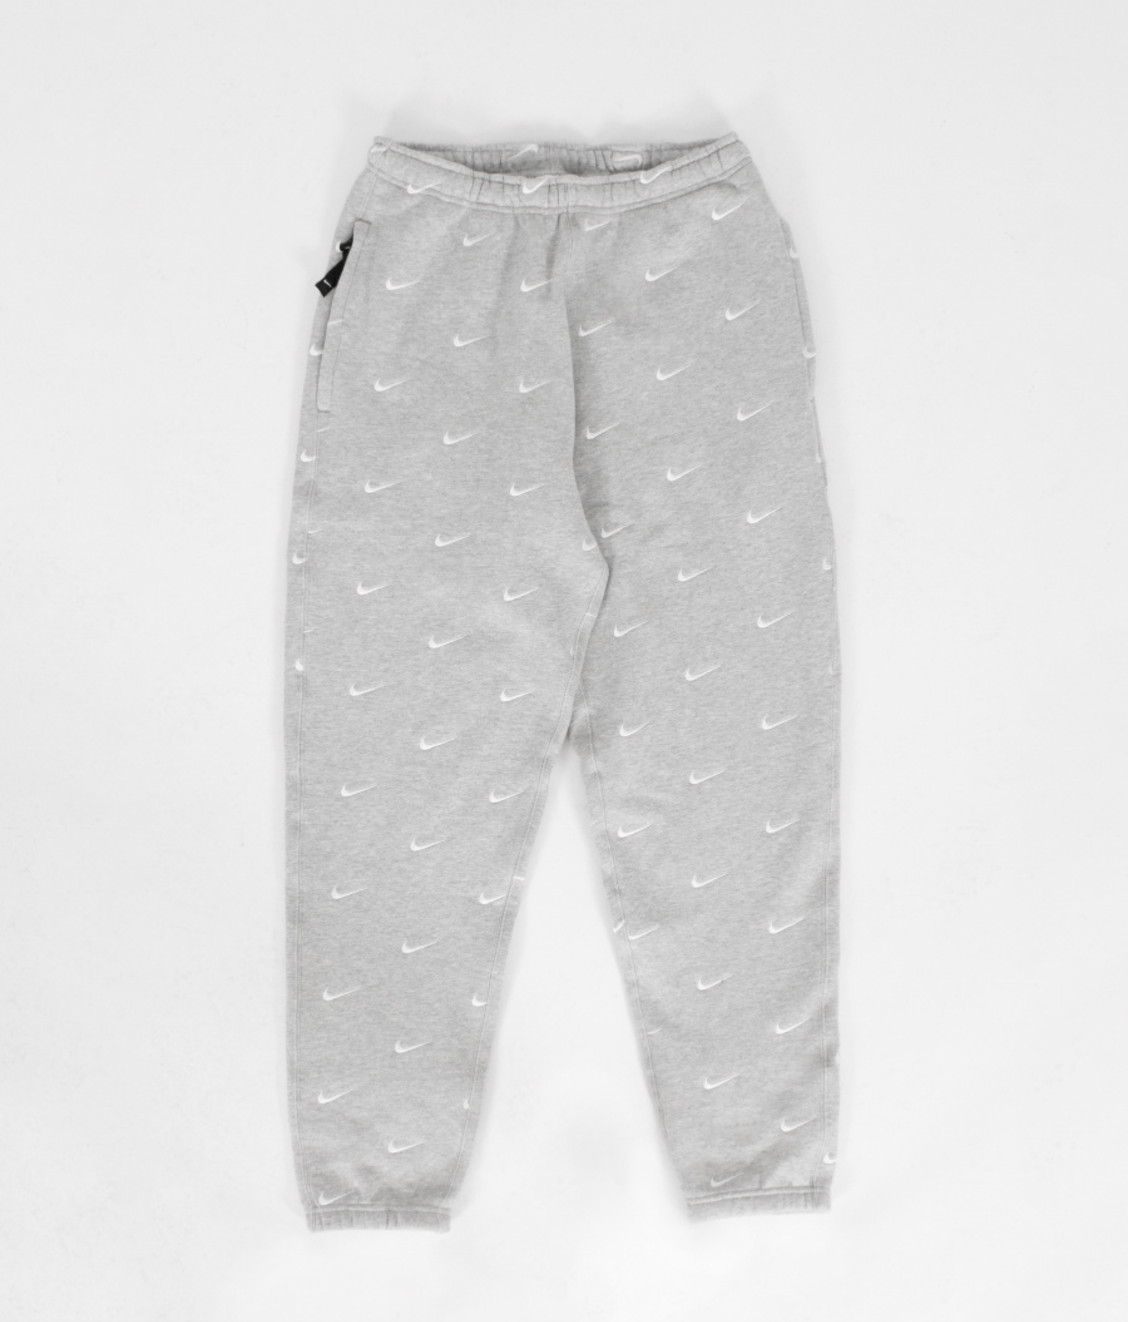 Nike Nike NRG All Over Swoosh Sweat Pants Grey